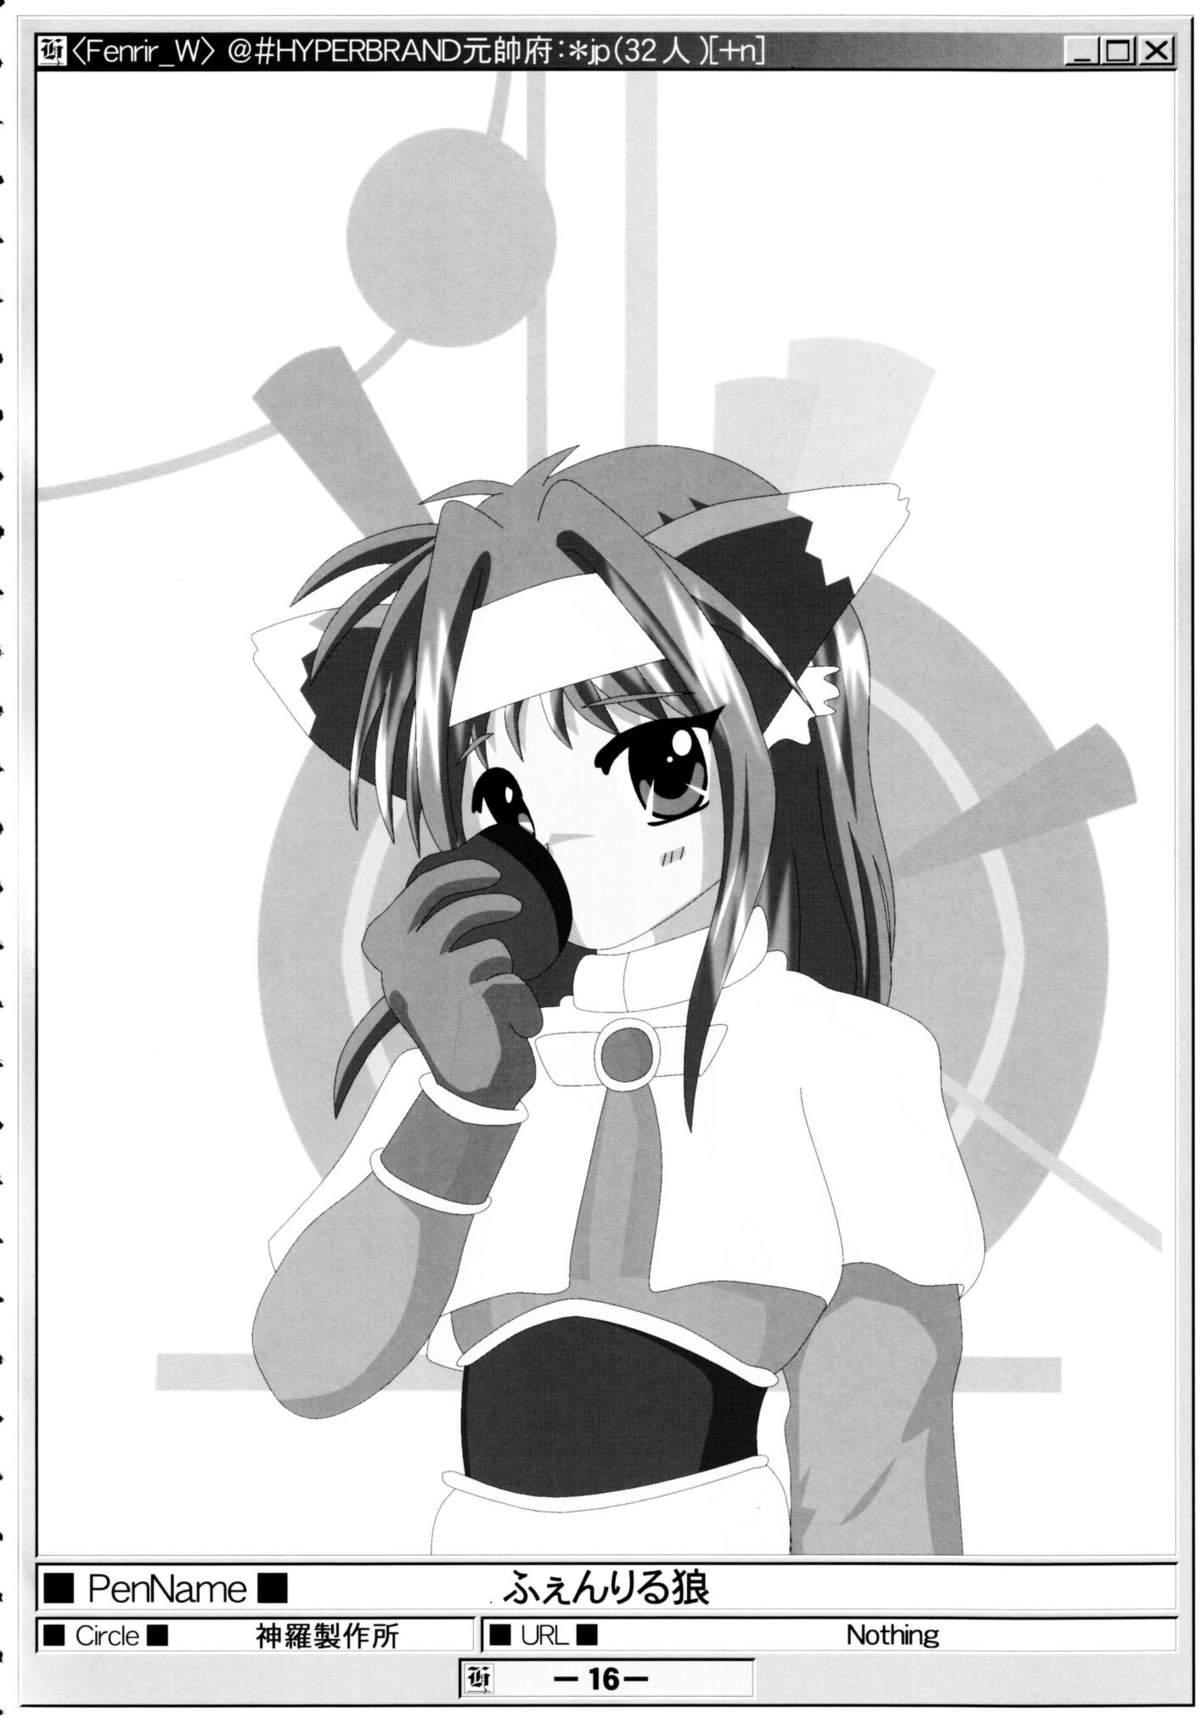 (Puniket 07) [HYPER BRAND (Deden, Ishihara Masumi, Kawamura Yasuhito)]  (Ragnarok Online) 14